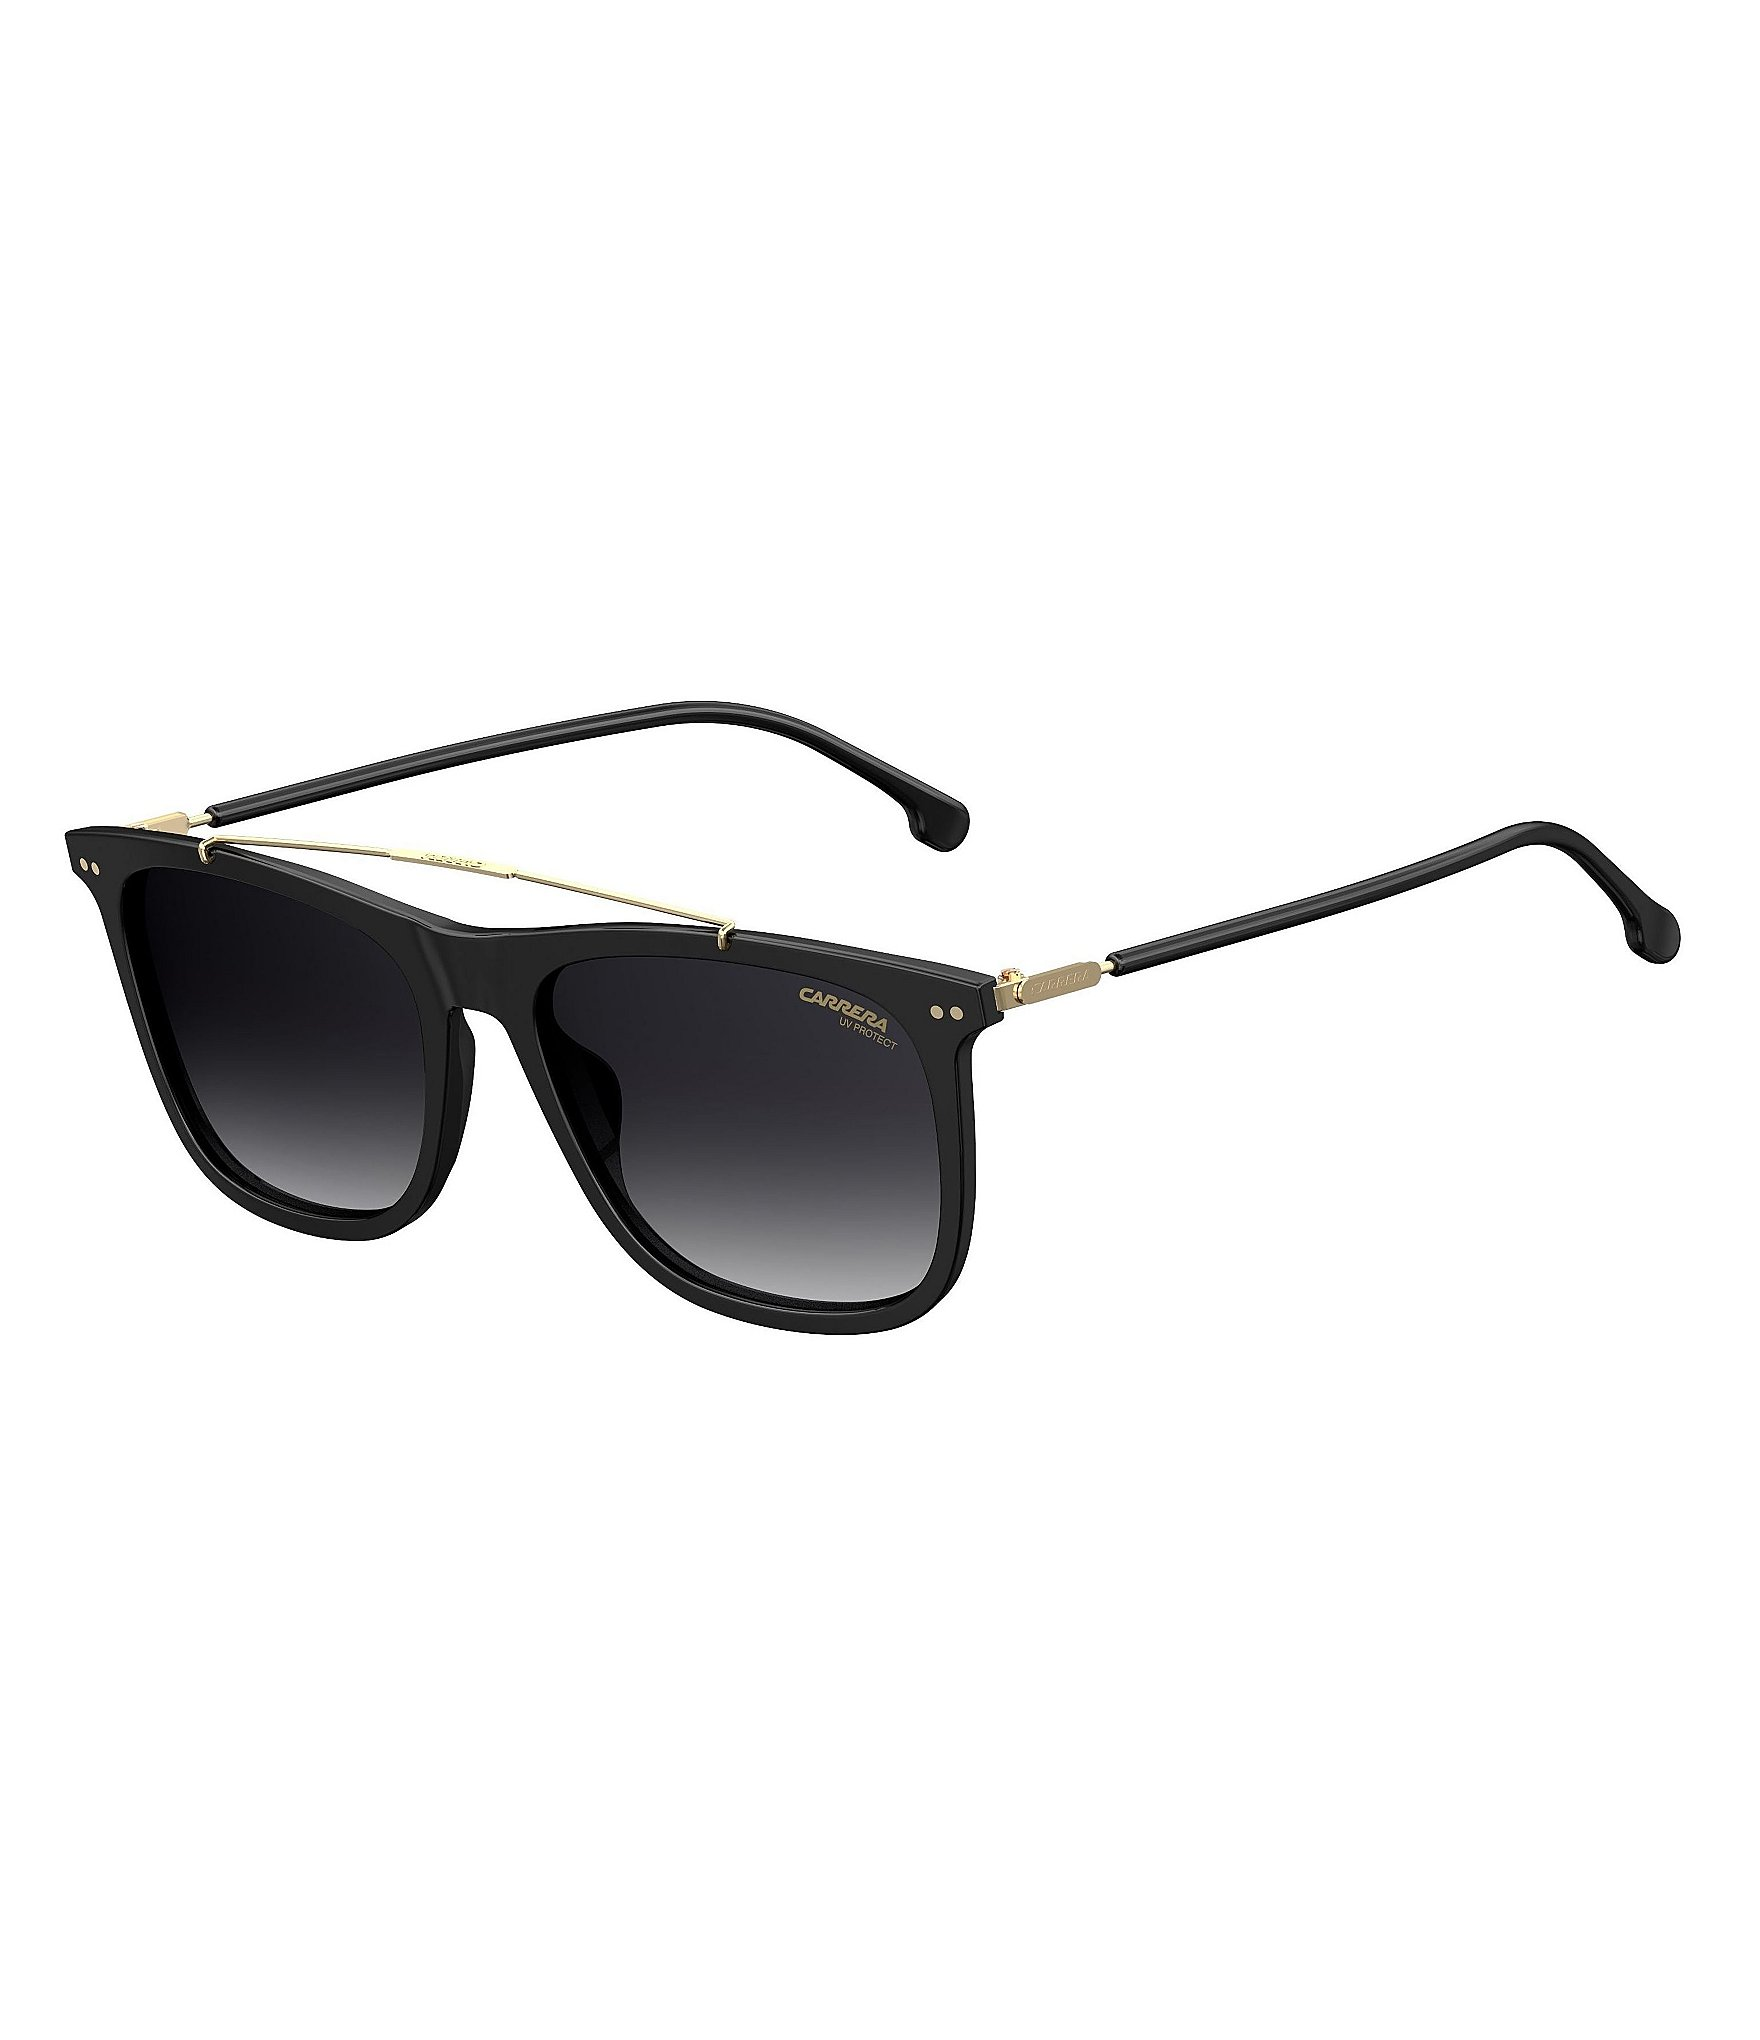 1760x2040 Accessories Sunglasses Amp Eyewear Women's Sunglasses Amp Eyewear